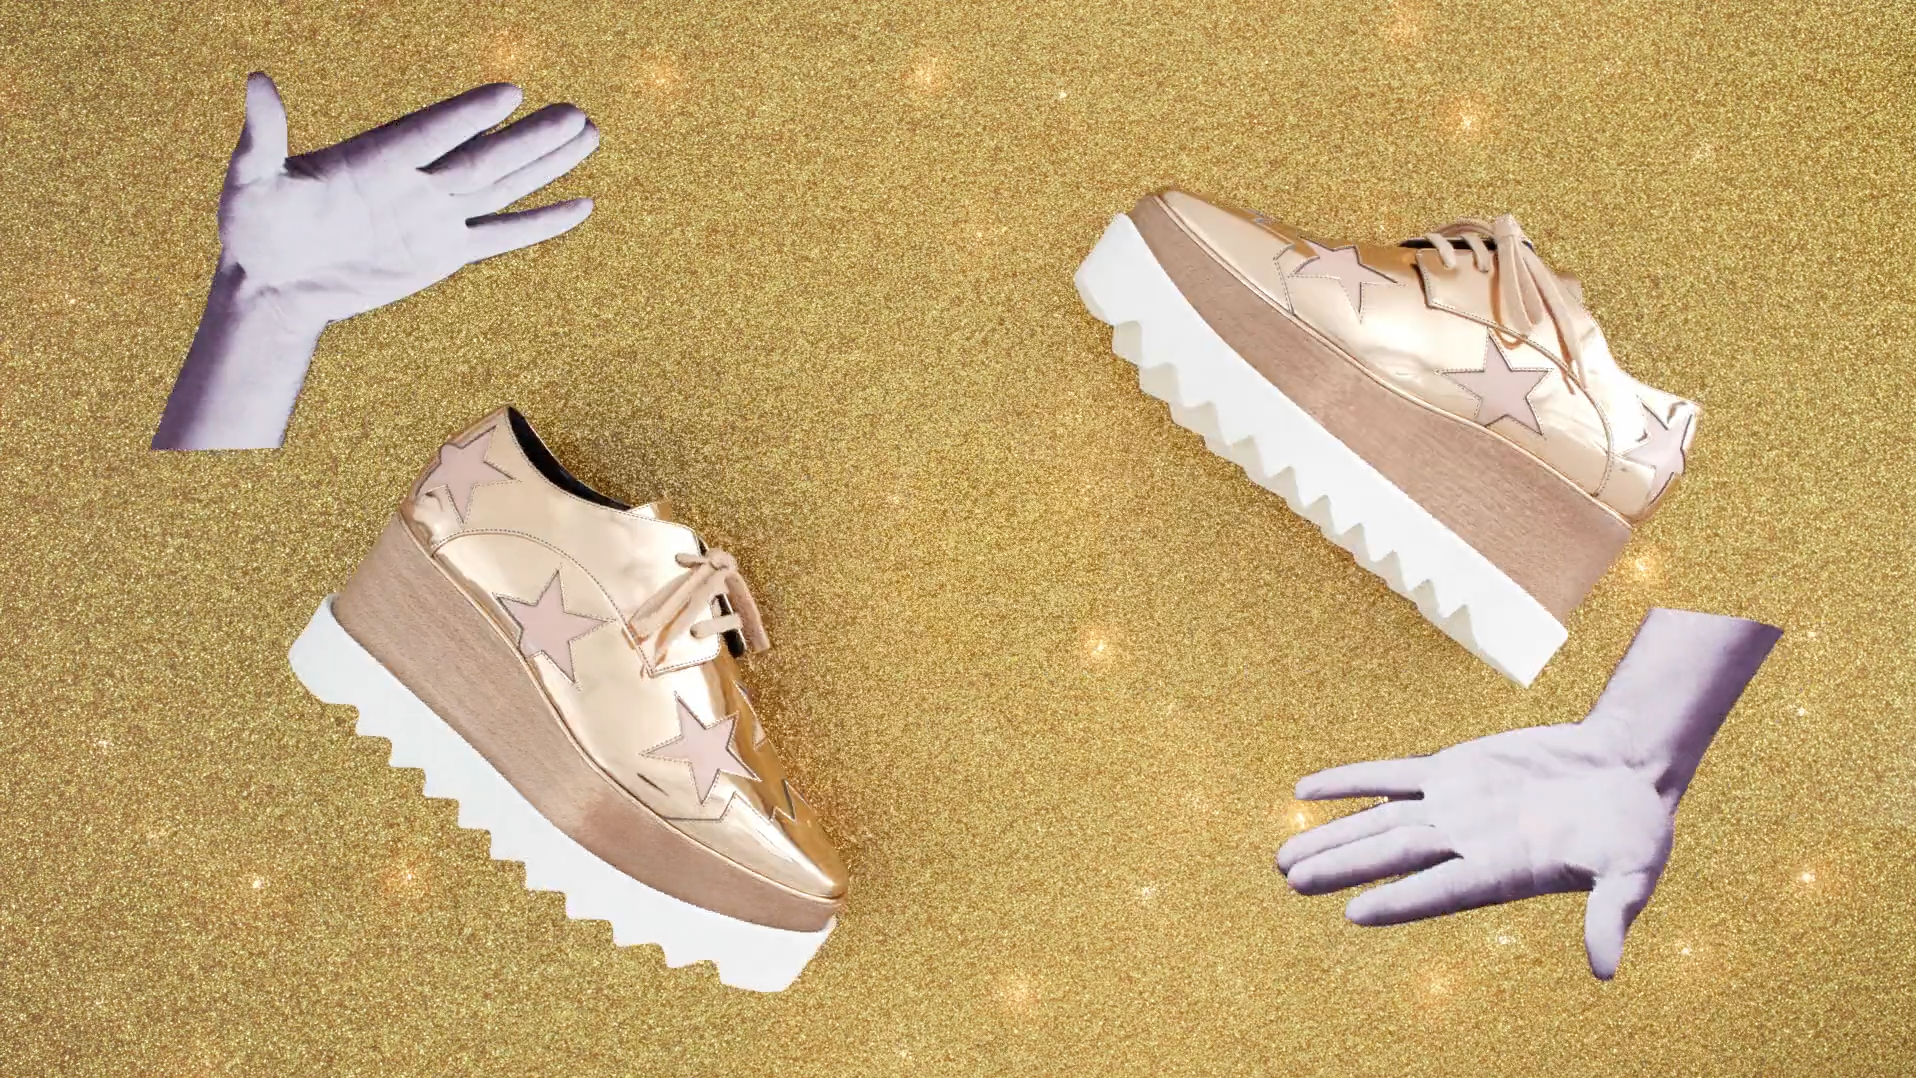 jen_campbell_stop_motion_fashion_stella_mccartney_shoes_3